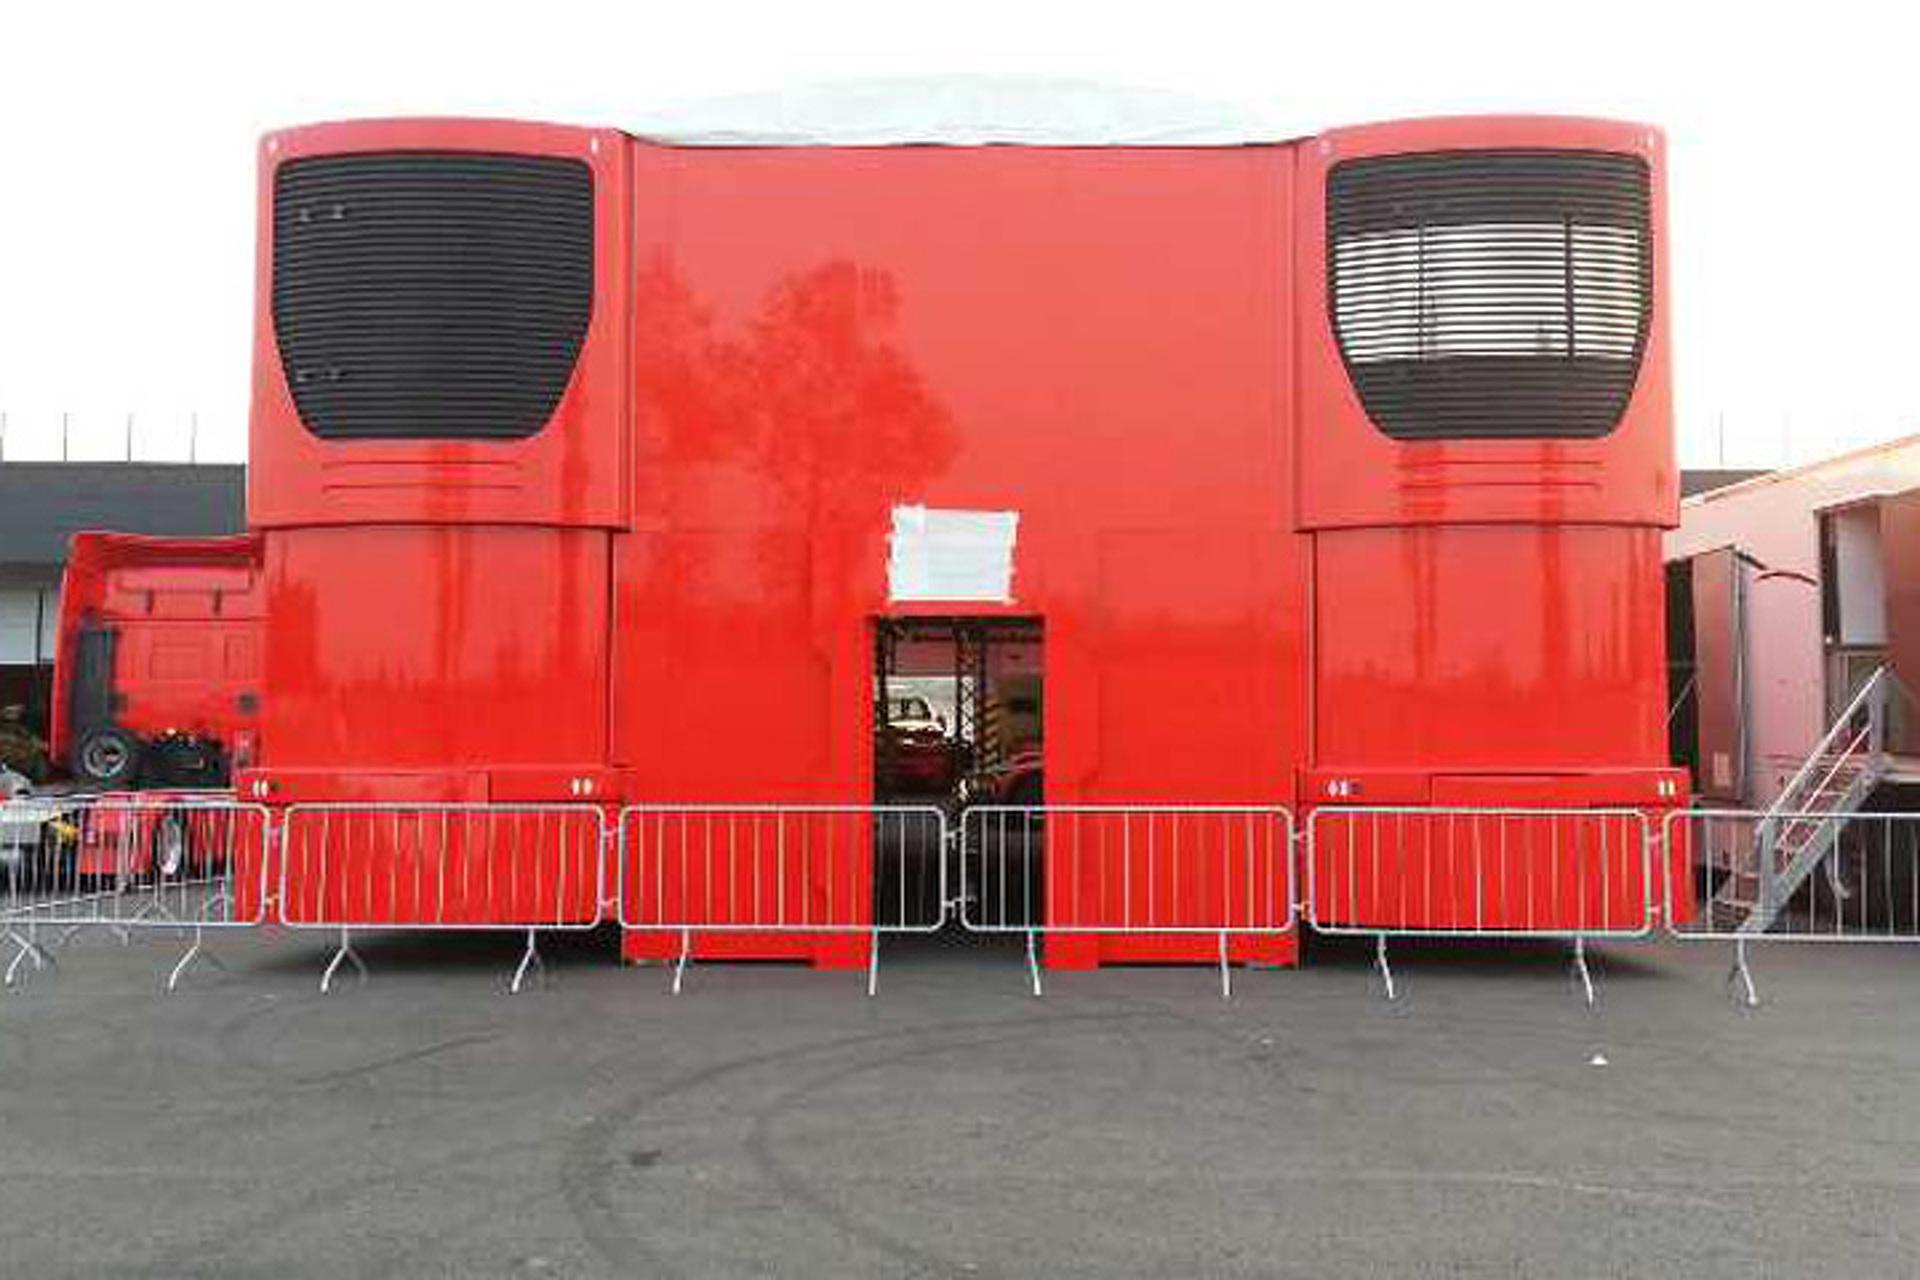 Give these Ferrari F1 Trailers a New Home